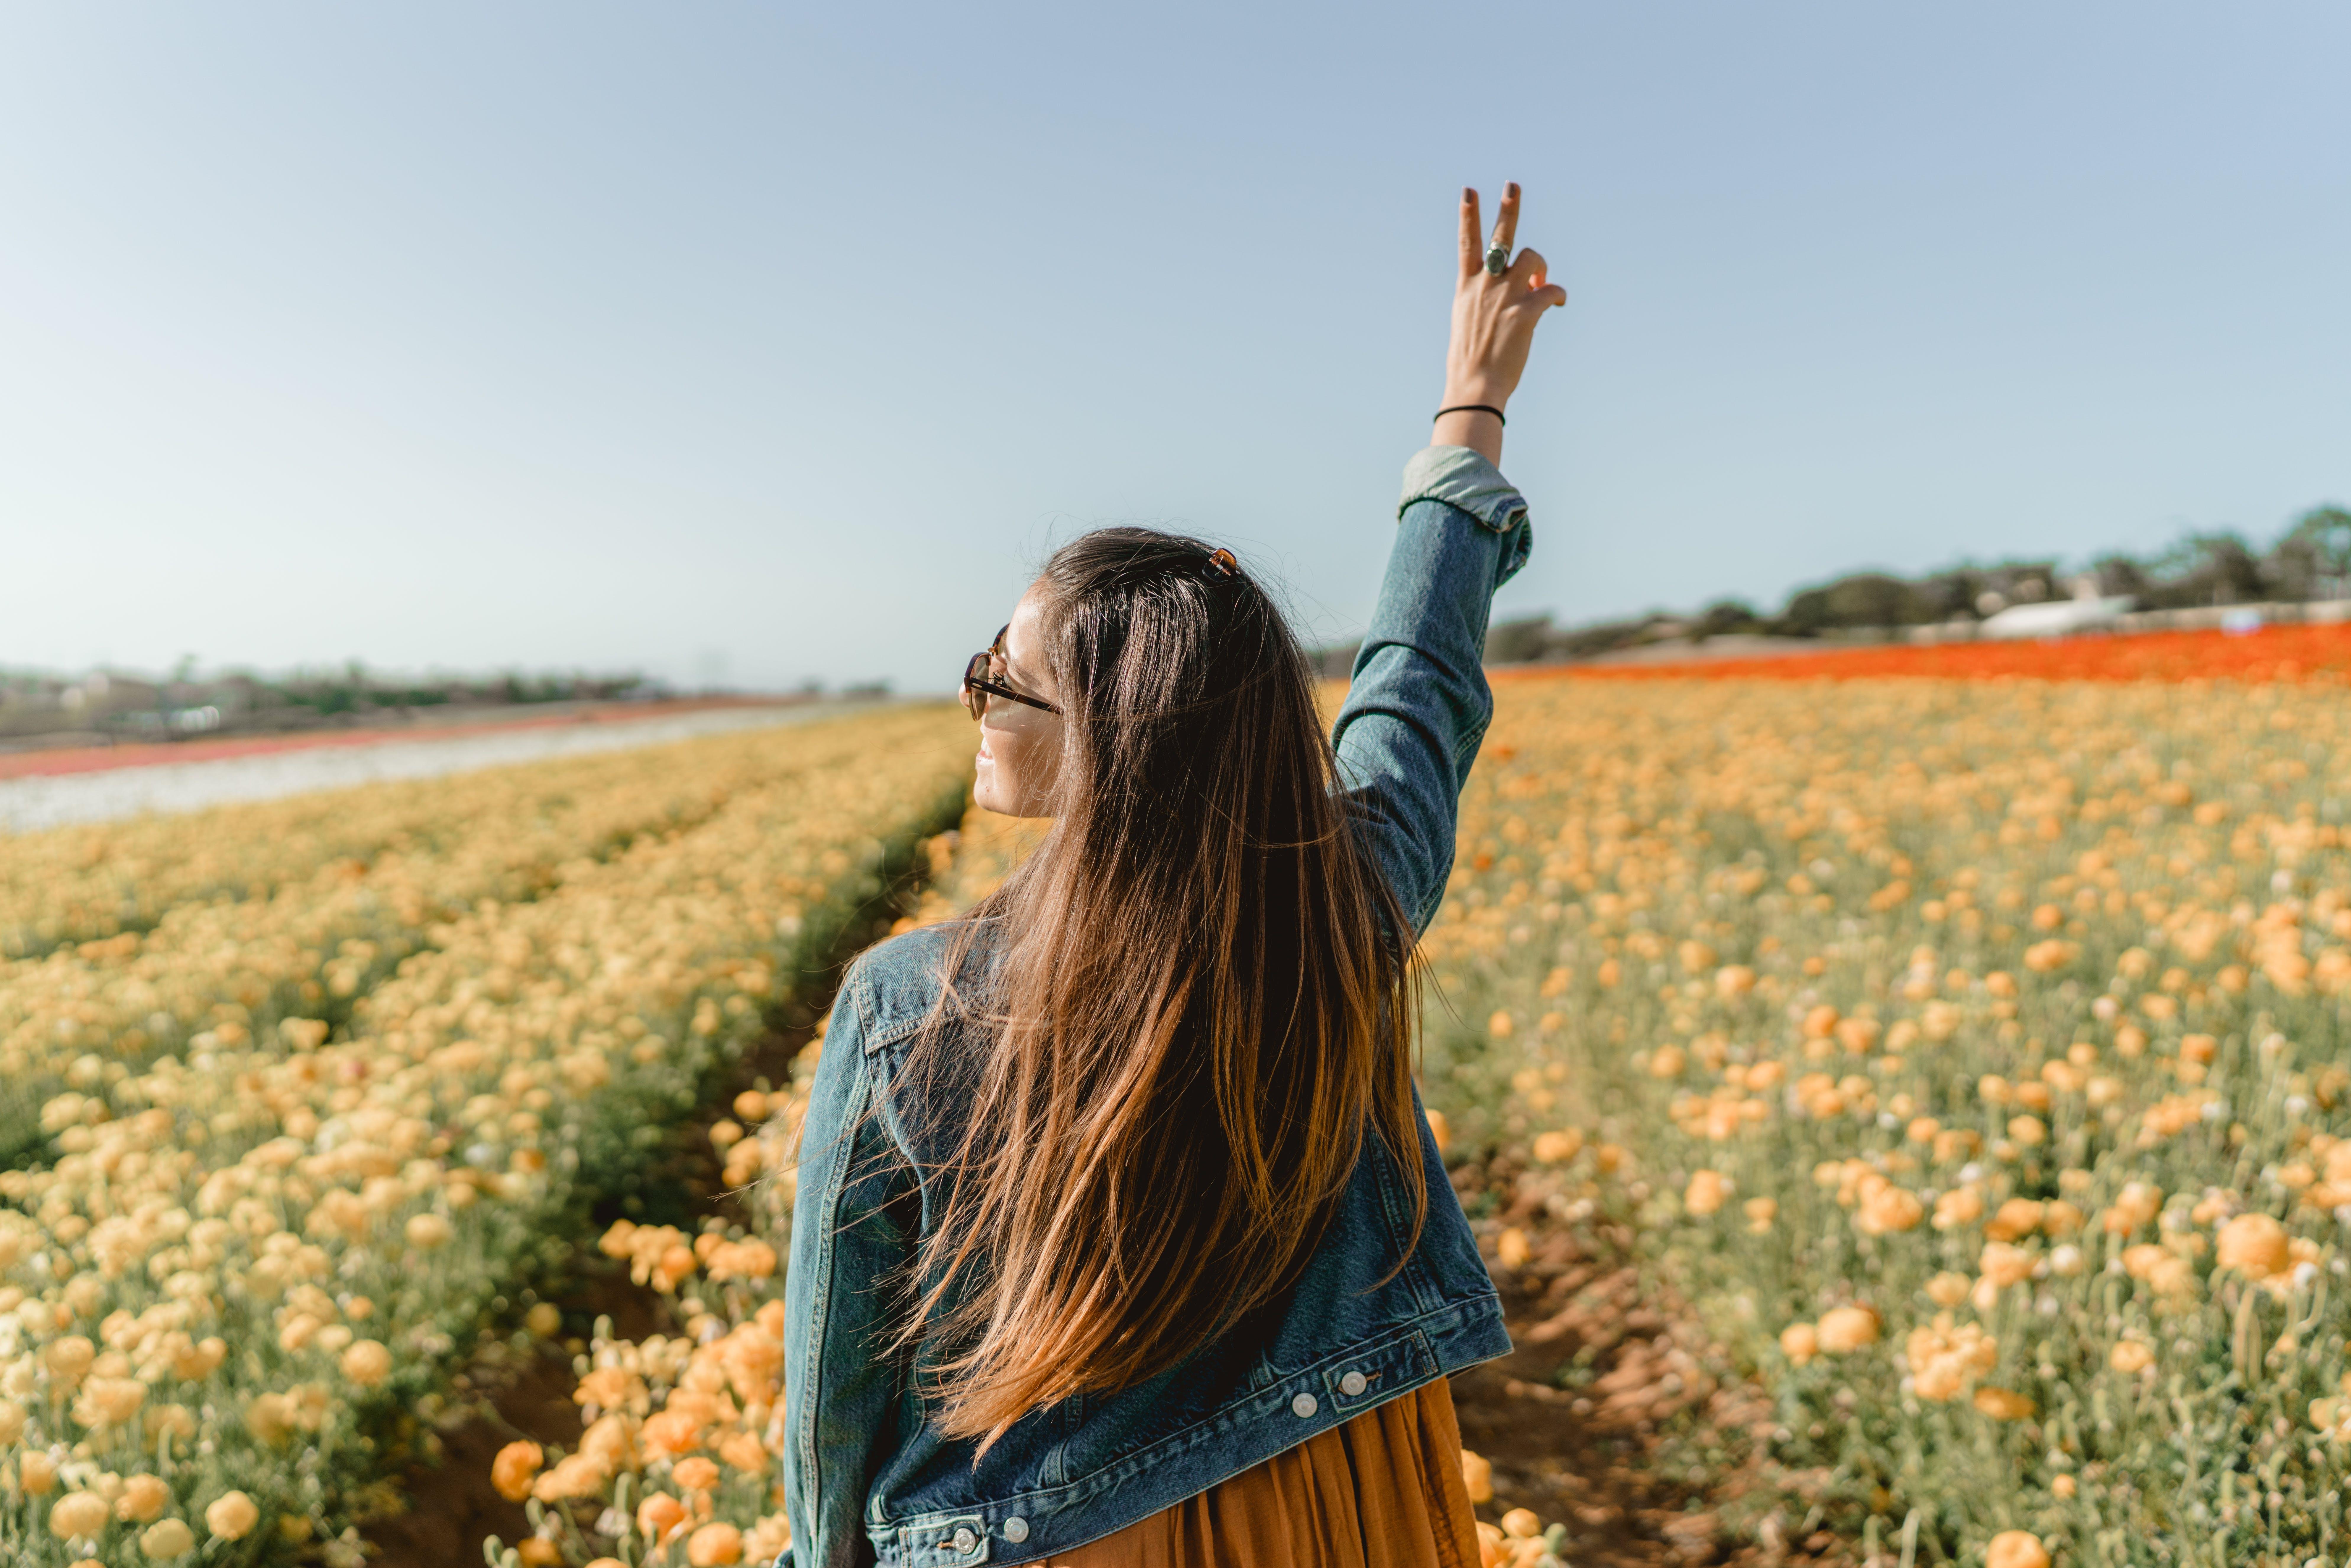 Woman Standing On Yellow Petaled Flower Garden Raising Hand